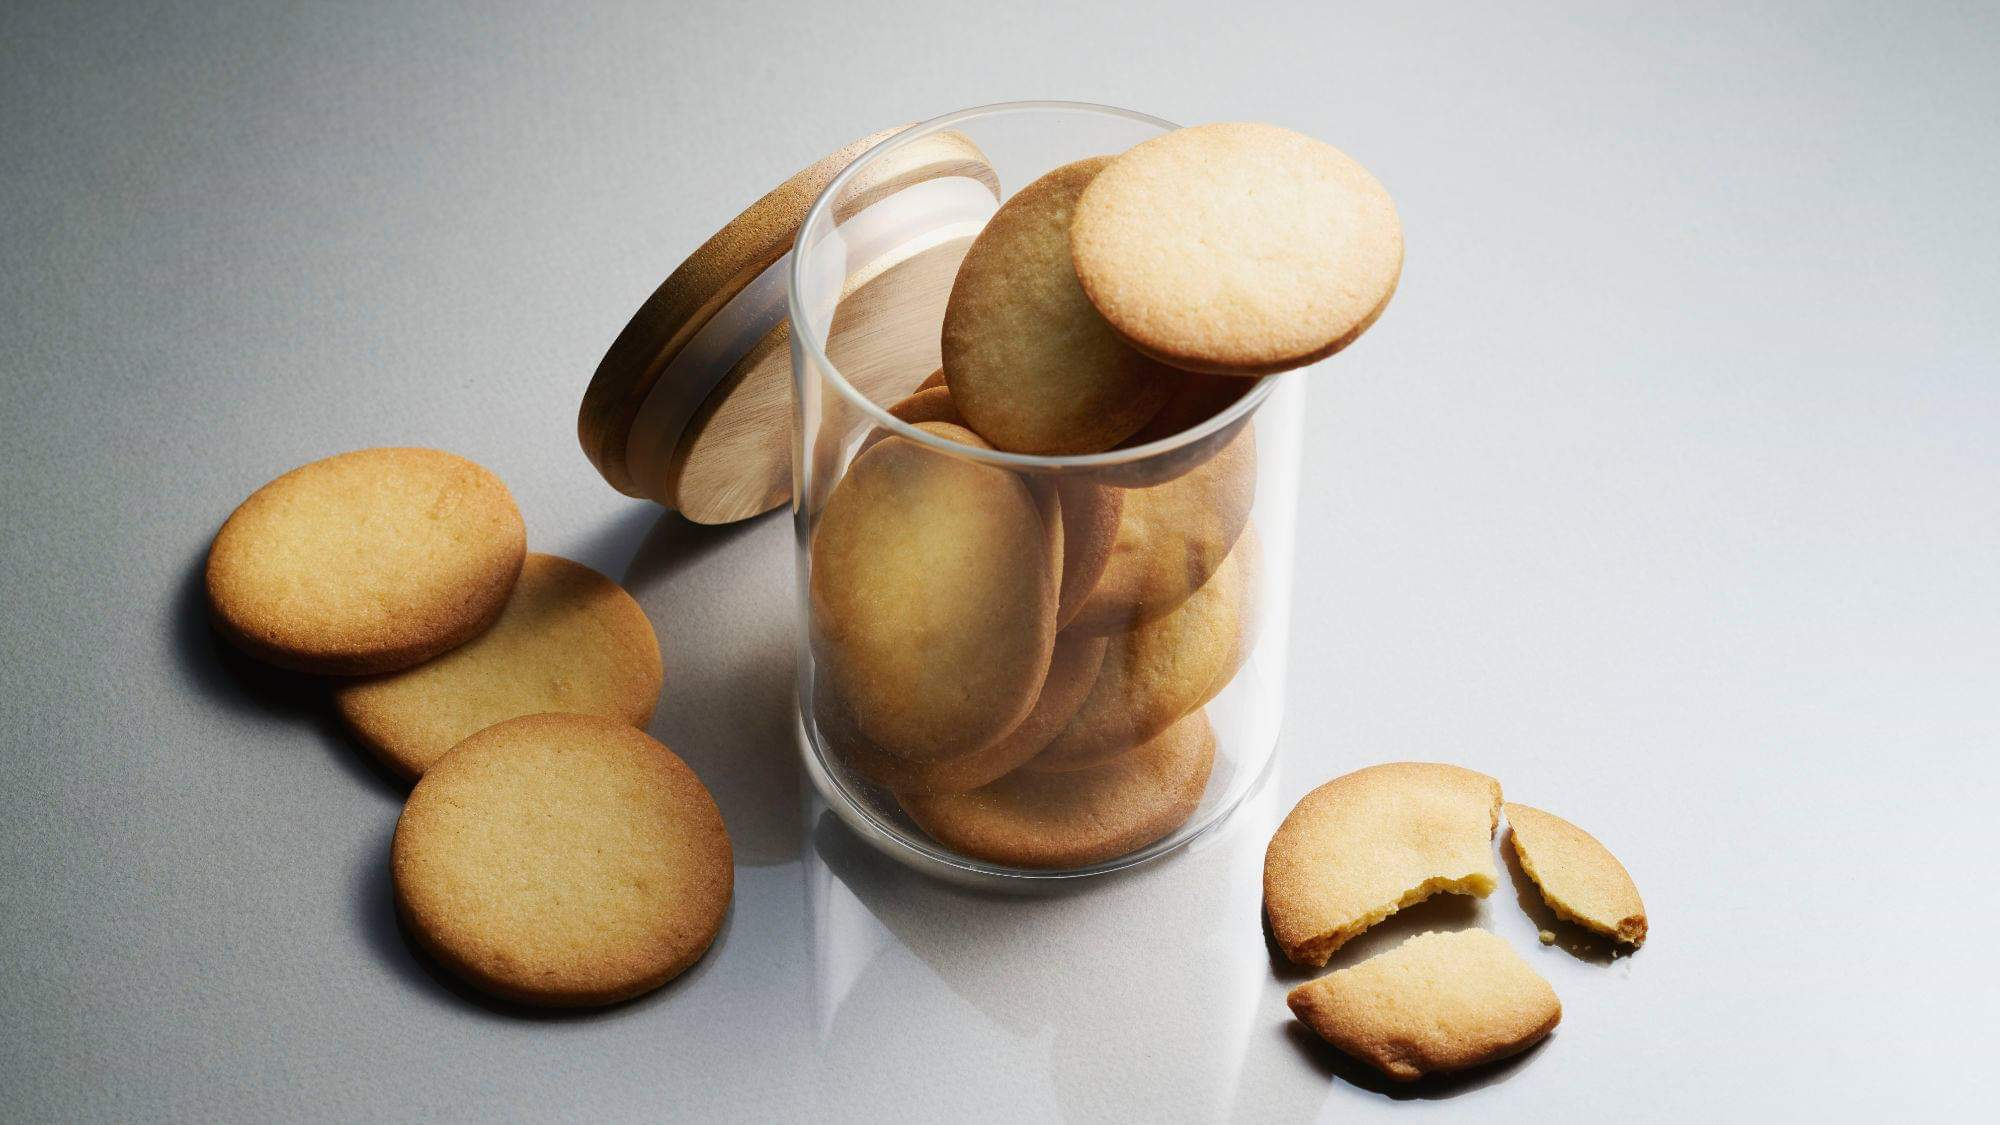 Galerie d'image - Biscuiterie Maison Drans